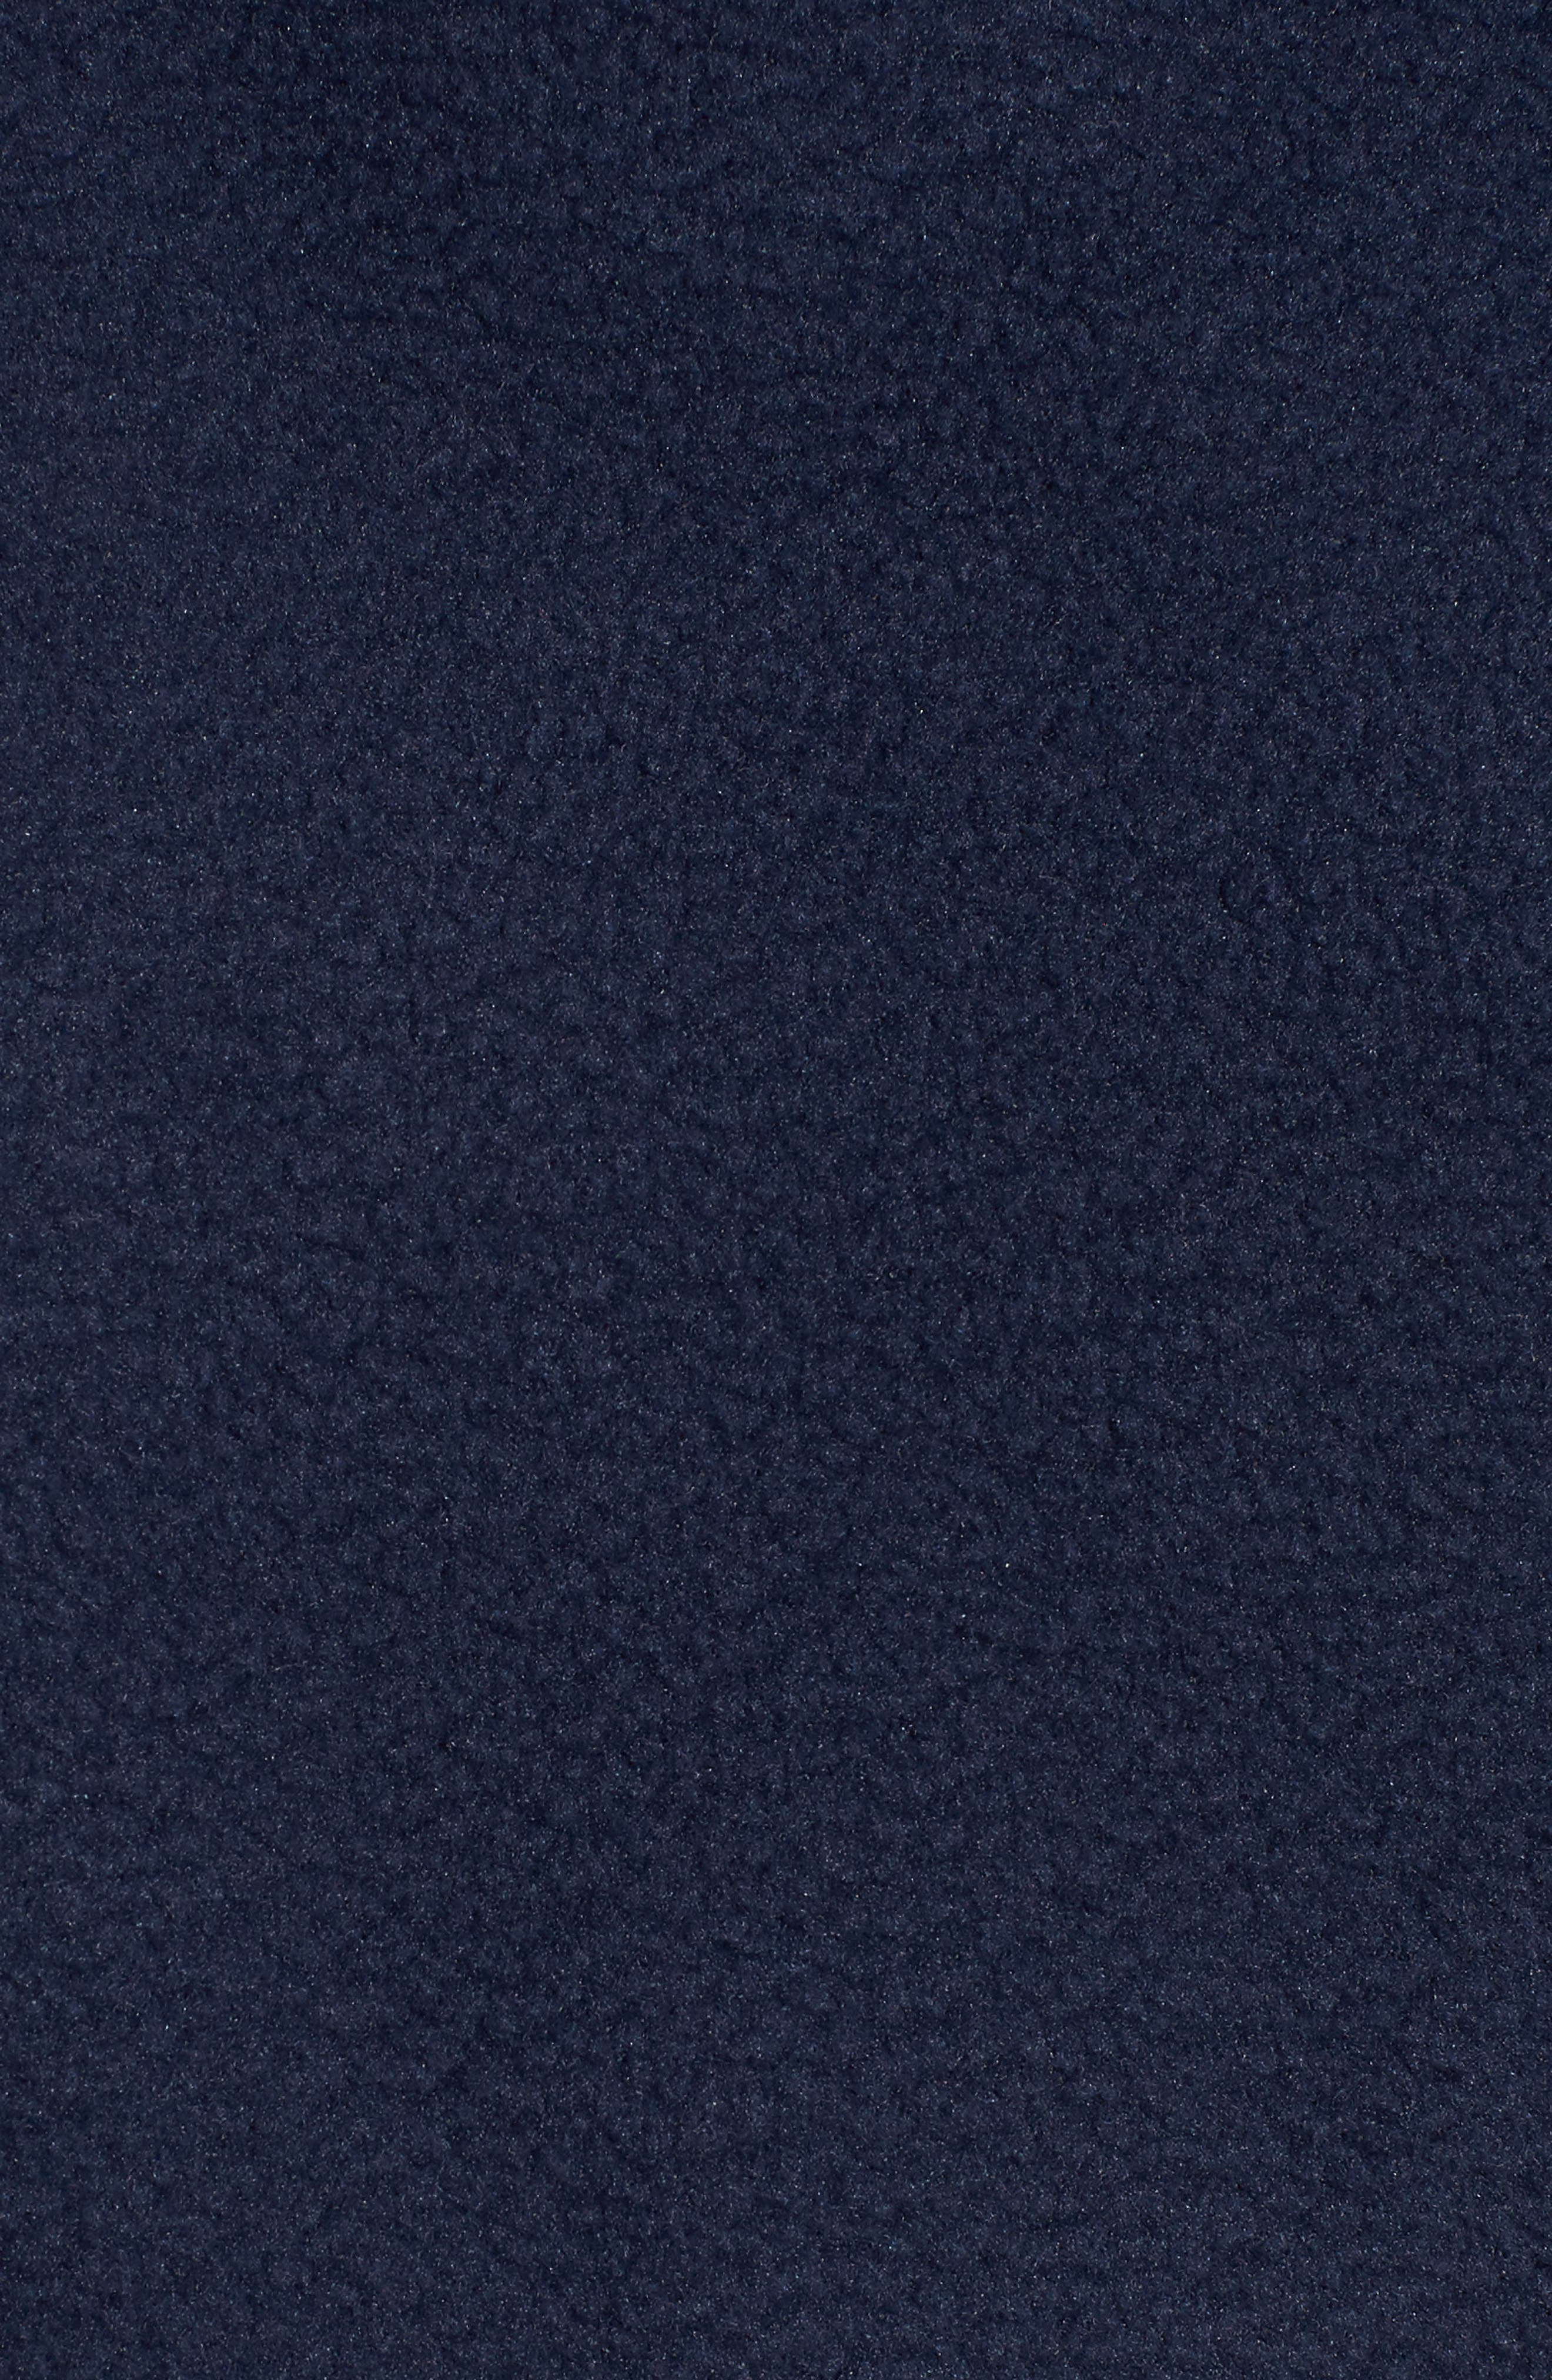 TJW Classics Polar Fleece Sweatshirt,                             Alternate thumbnail 5, color,                             002